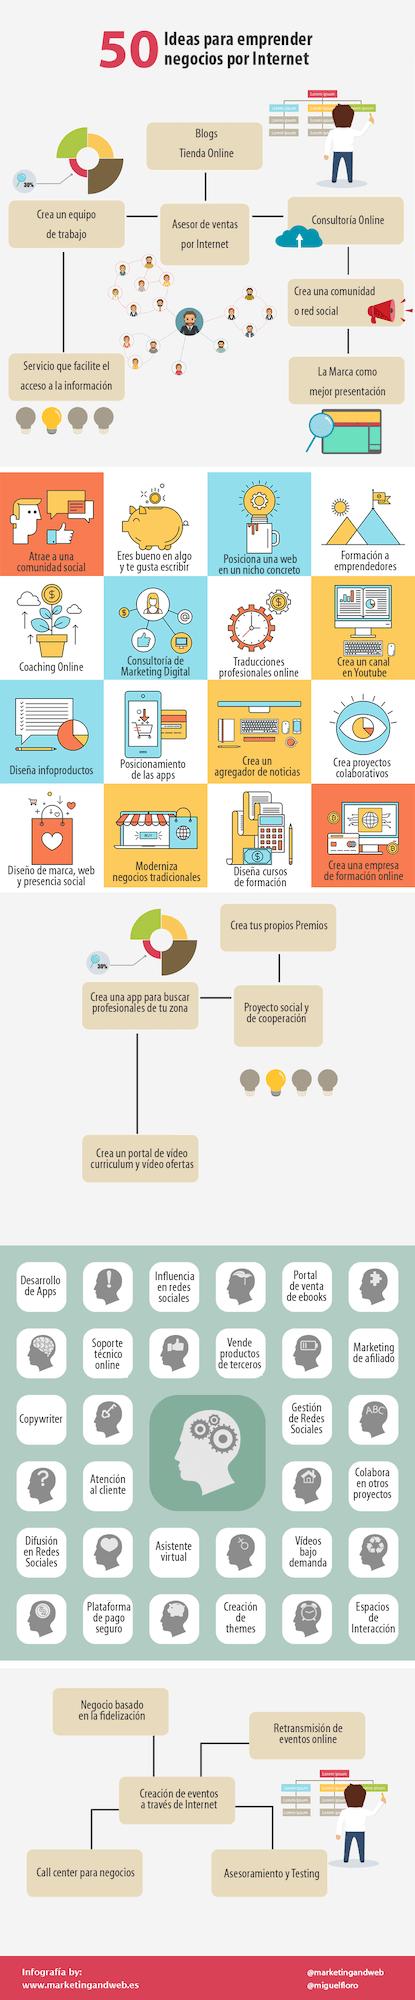 ideas para emprender negocios infografia